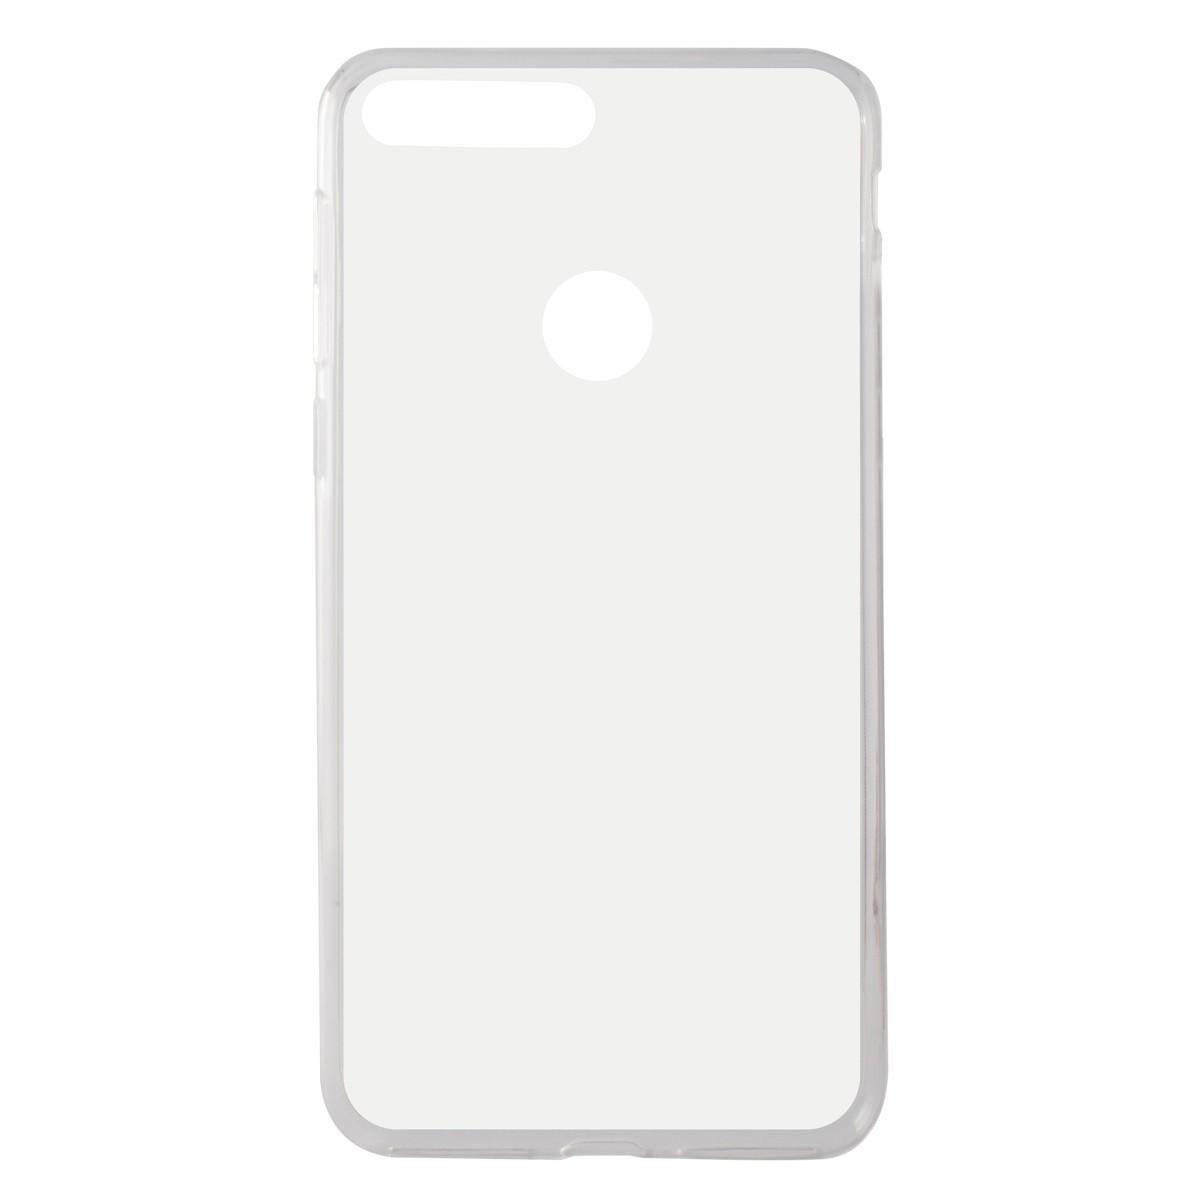 Funda Movil Ksix Huawei P Smart Transparente